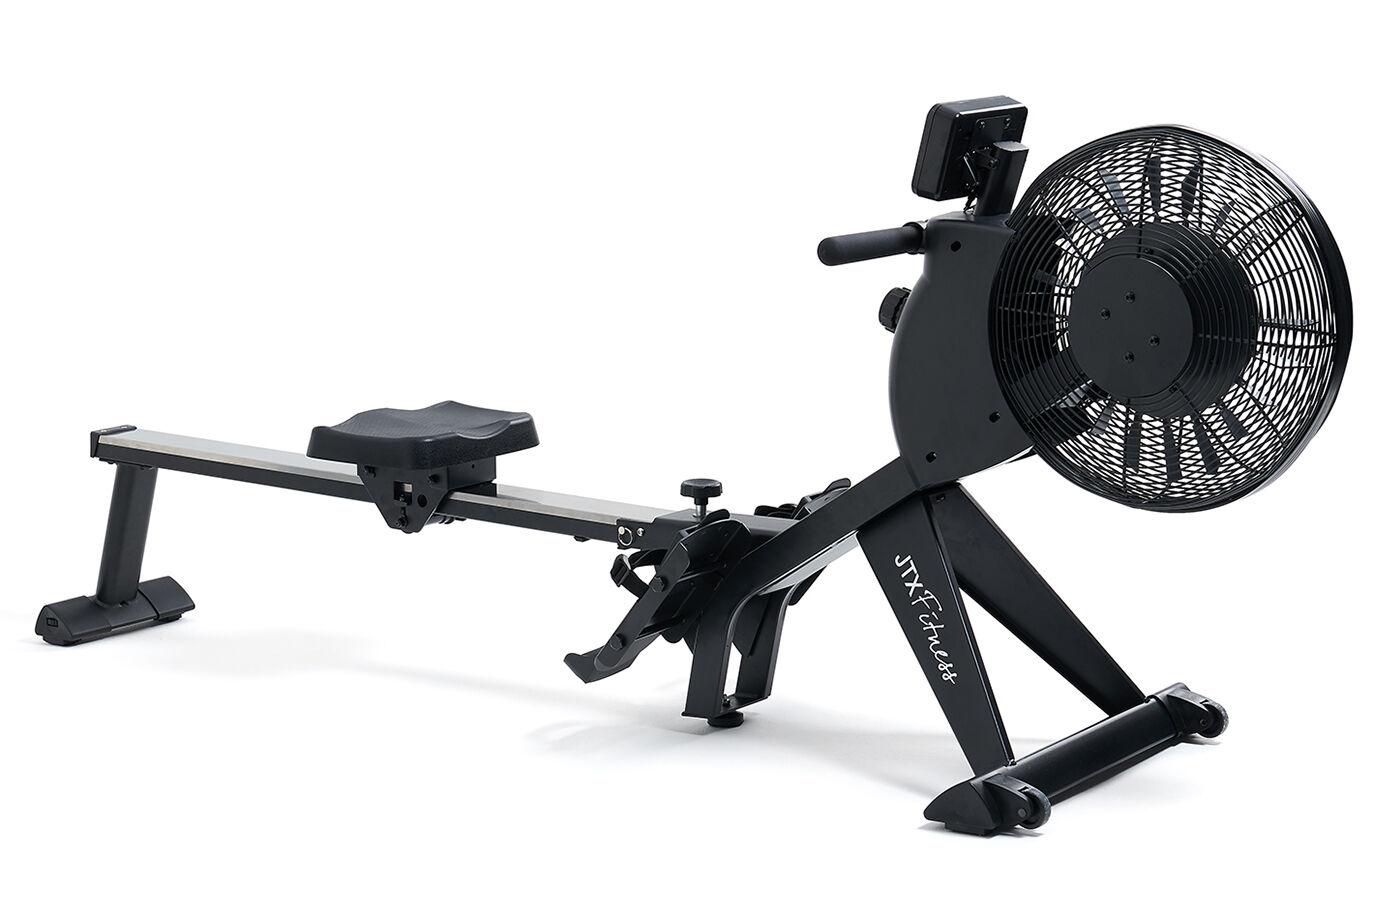 JTX Freedom Air Rowing Machine - Best Home Rowing Machine Reviews